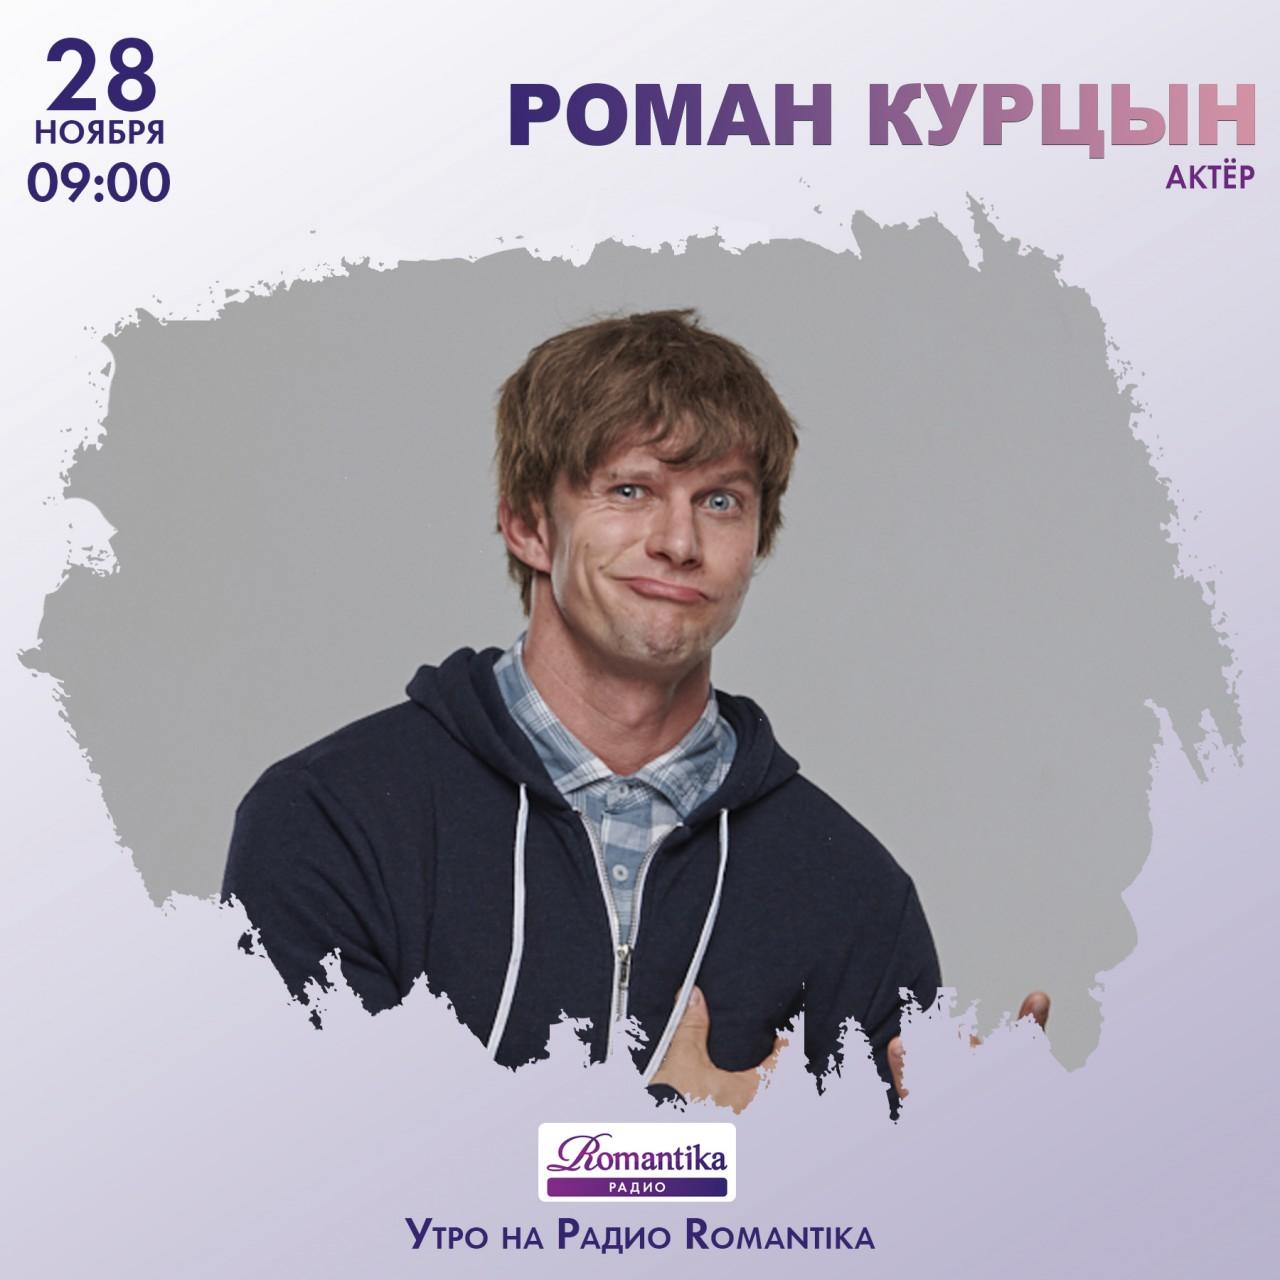 Радио Romantika: 28 ноября 9…